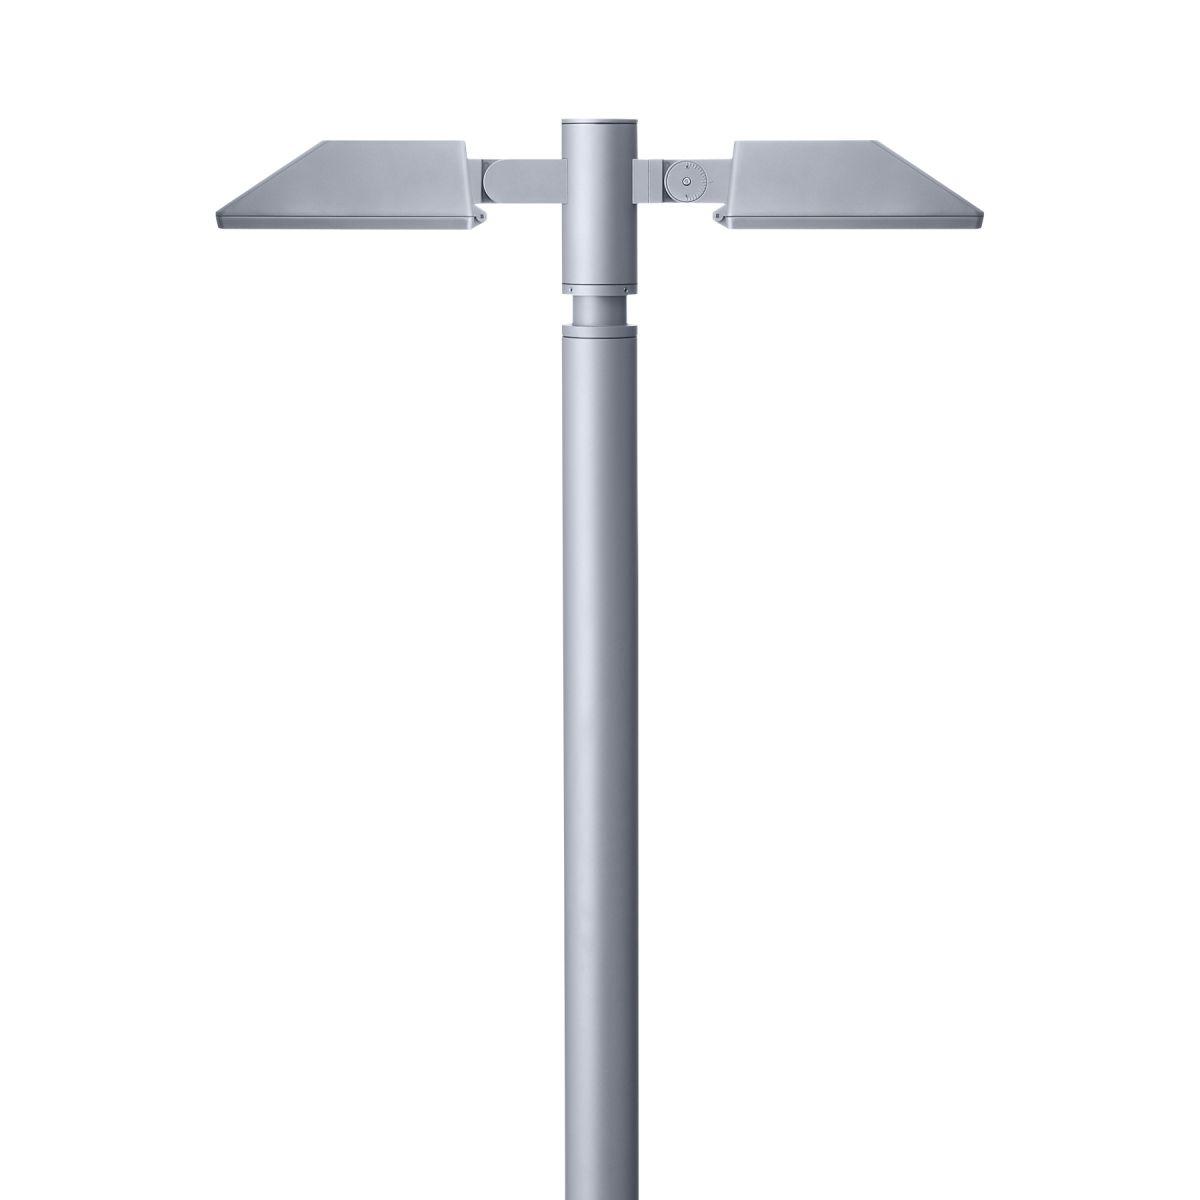 Small SIROCCO - Area Light / Bi-Symmetric Double Sided